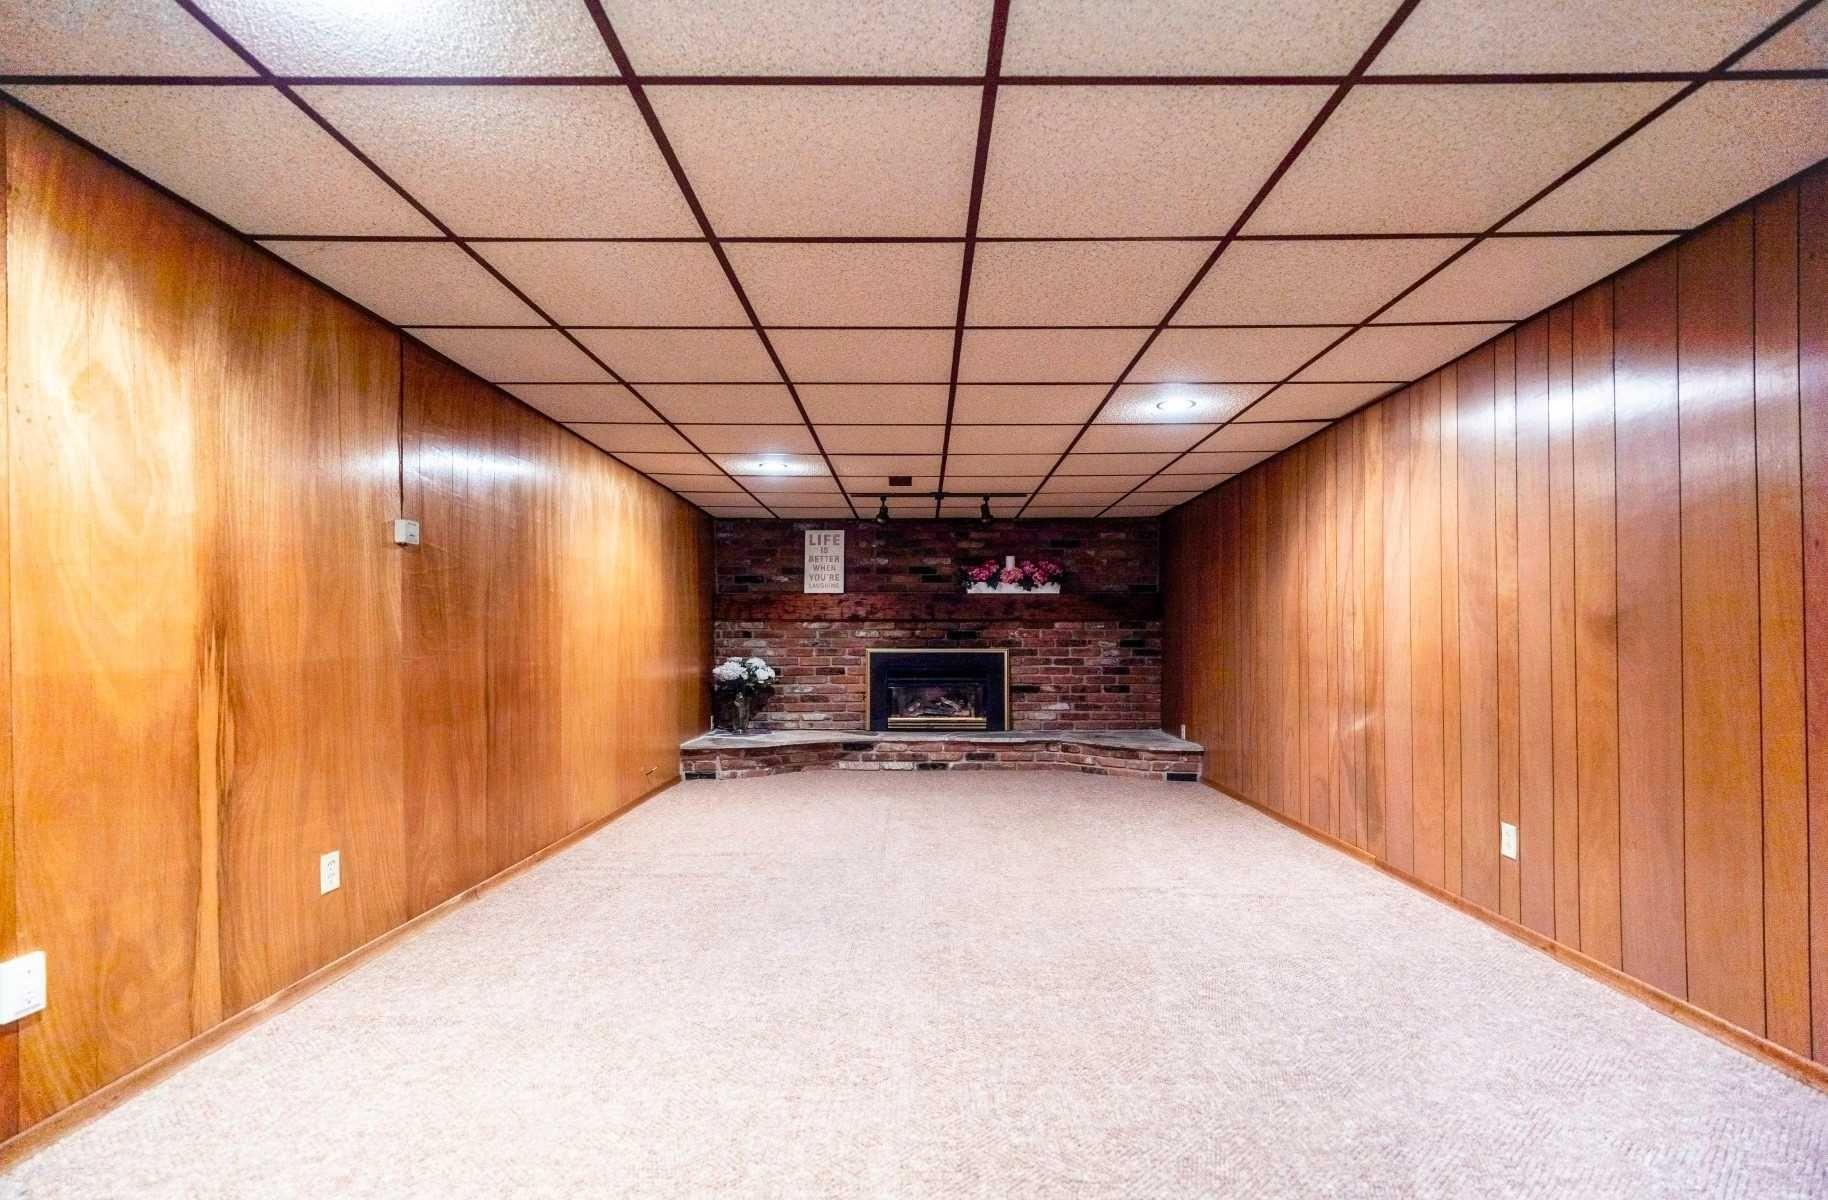 Photo 15: Photos: 1140 Northridge Street in Oshawa: Centennial House (Bungalow) for sale : MLS®# E4571459